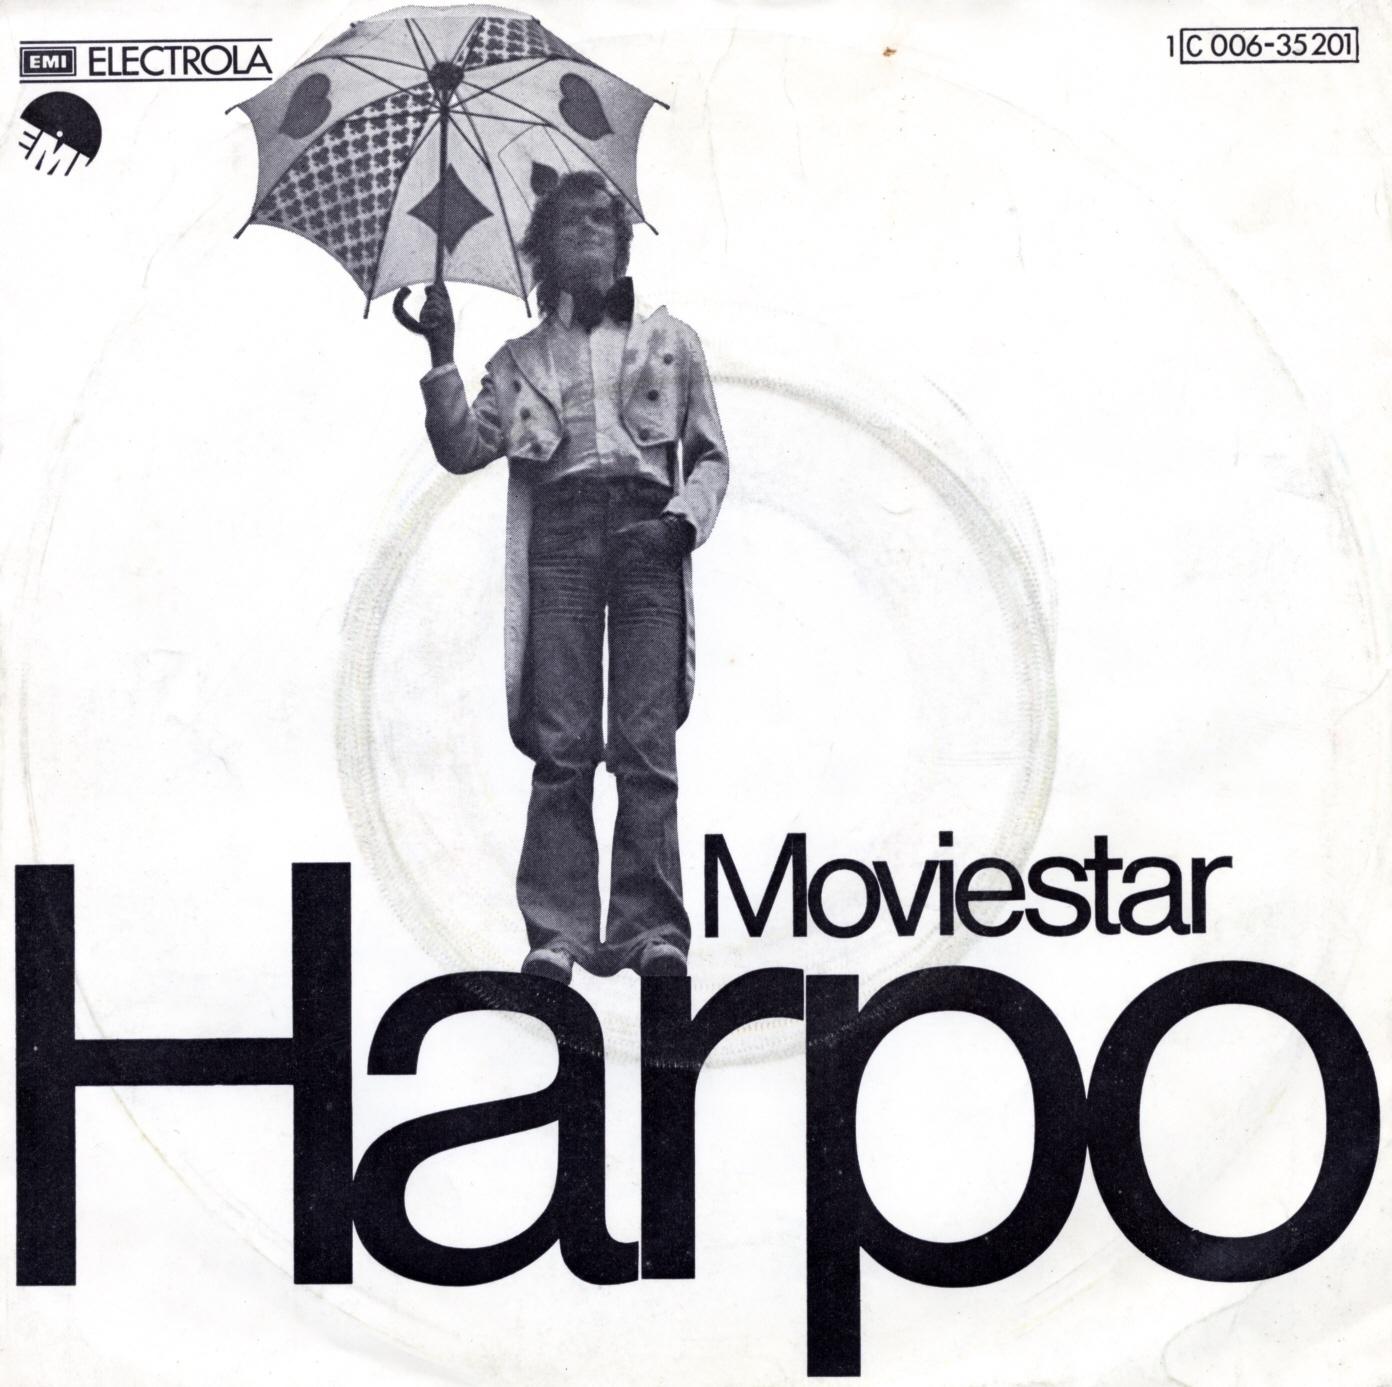 Moviestar (Foto: Harpo)